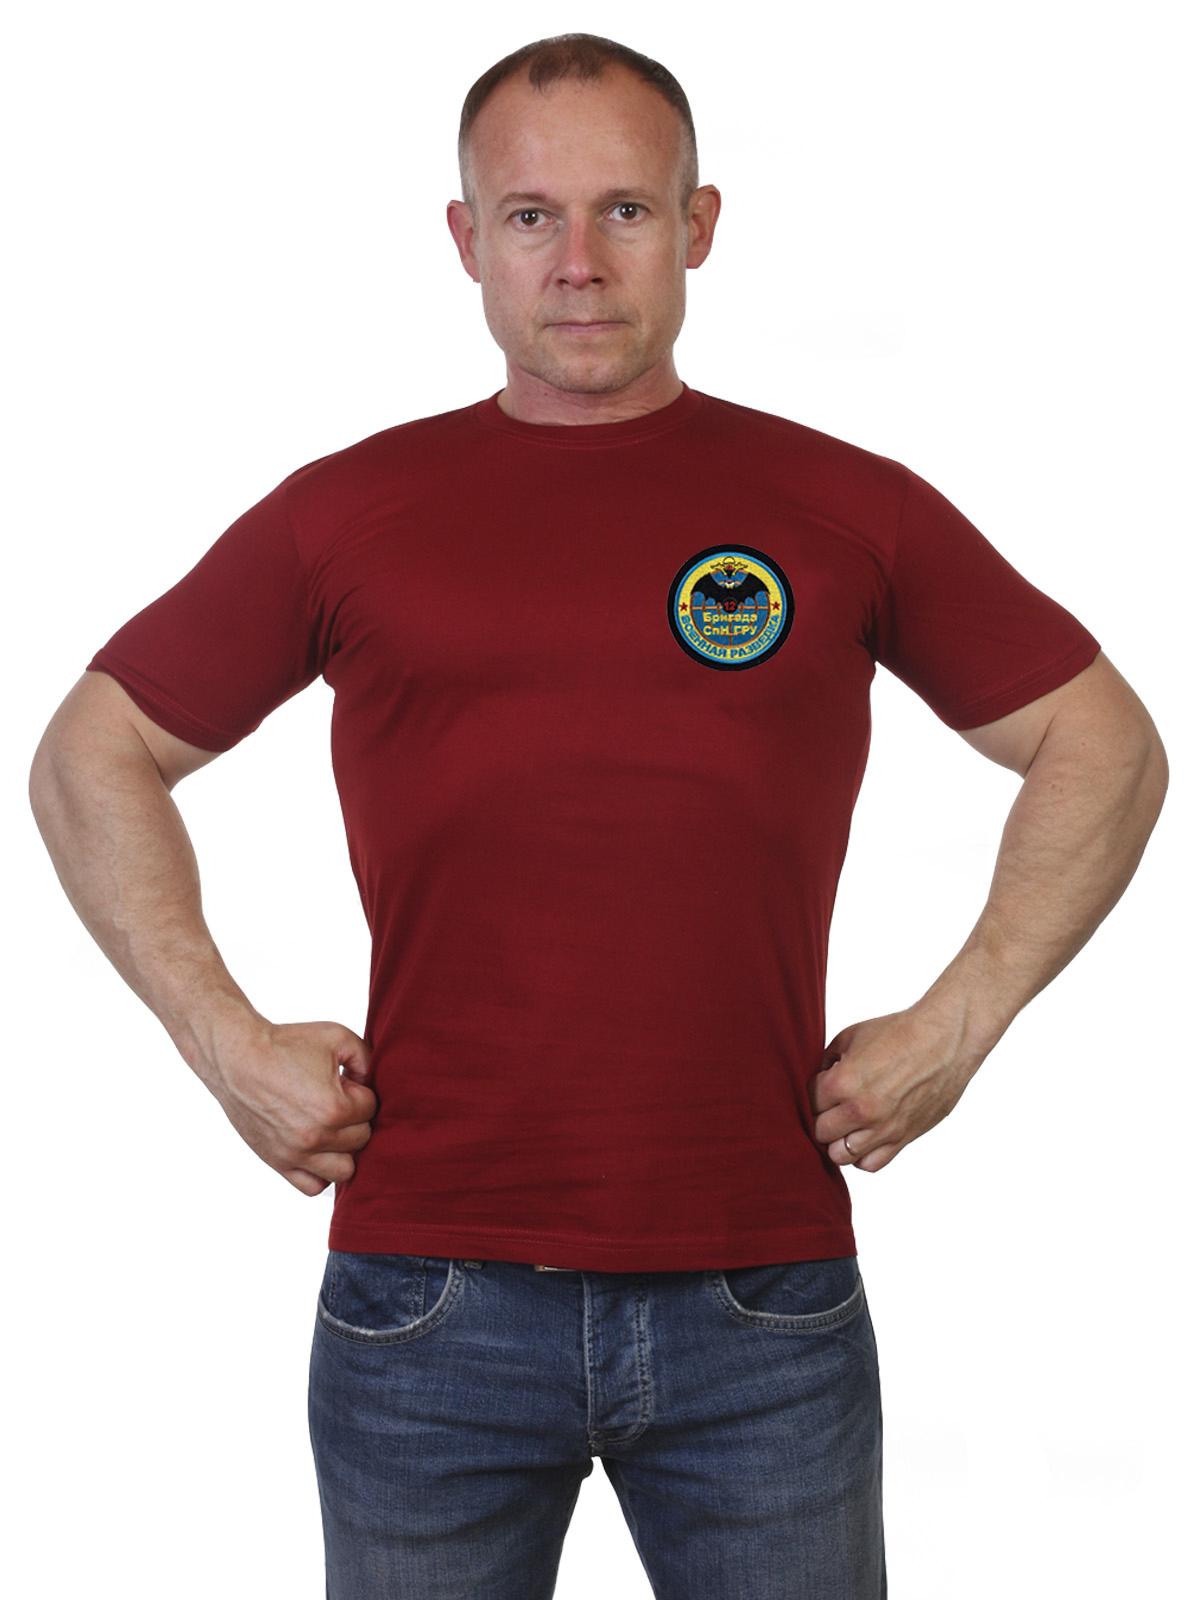 Одежда с символикой Спецназа ГРУ